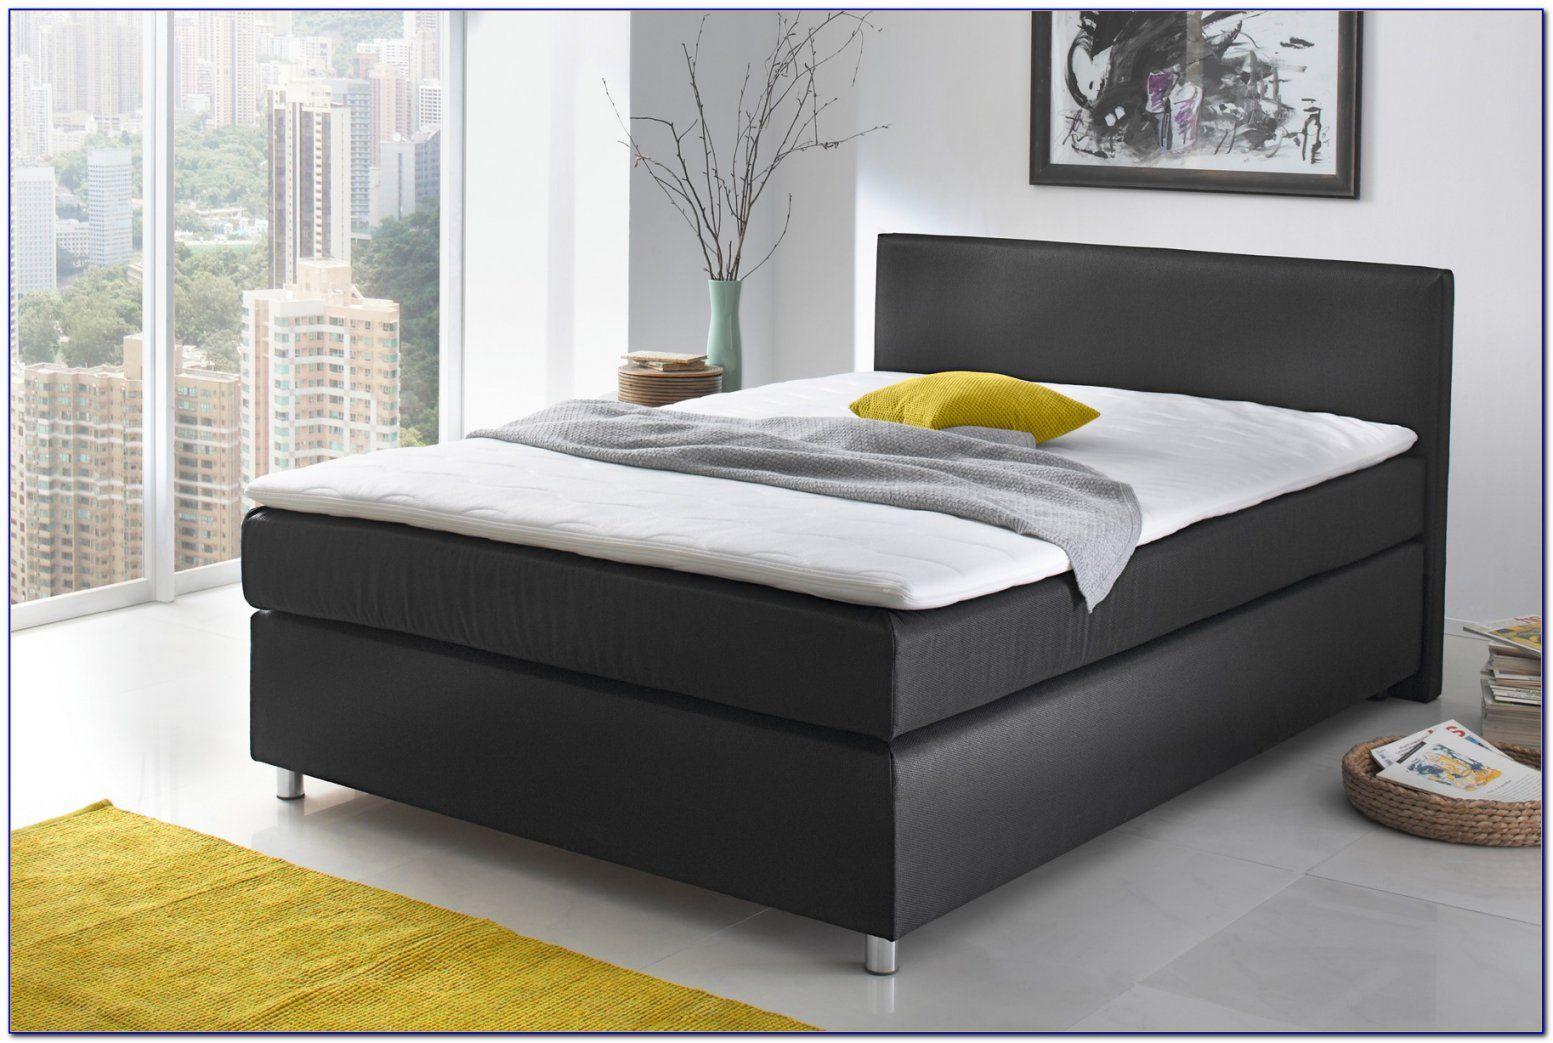 boxspringbetten m bel martin haus design ideen. Black Bedroom Furniture Sets. Home Design Ideas